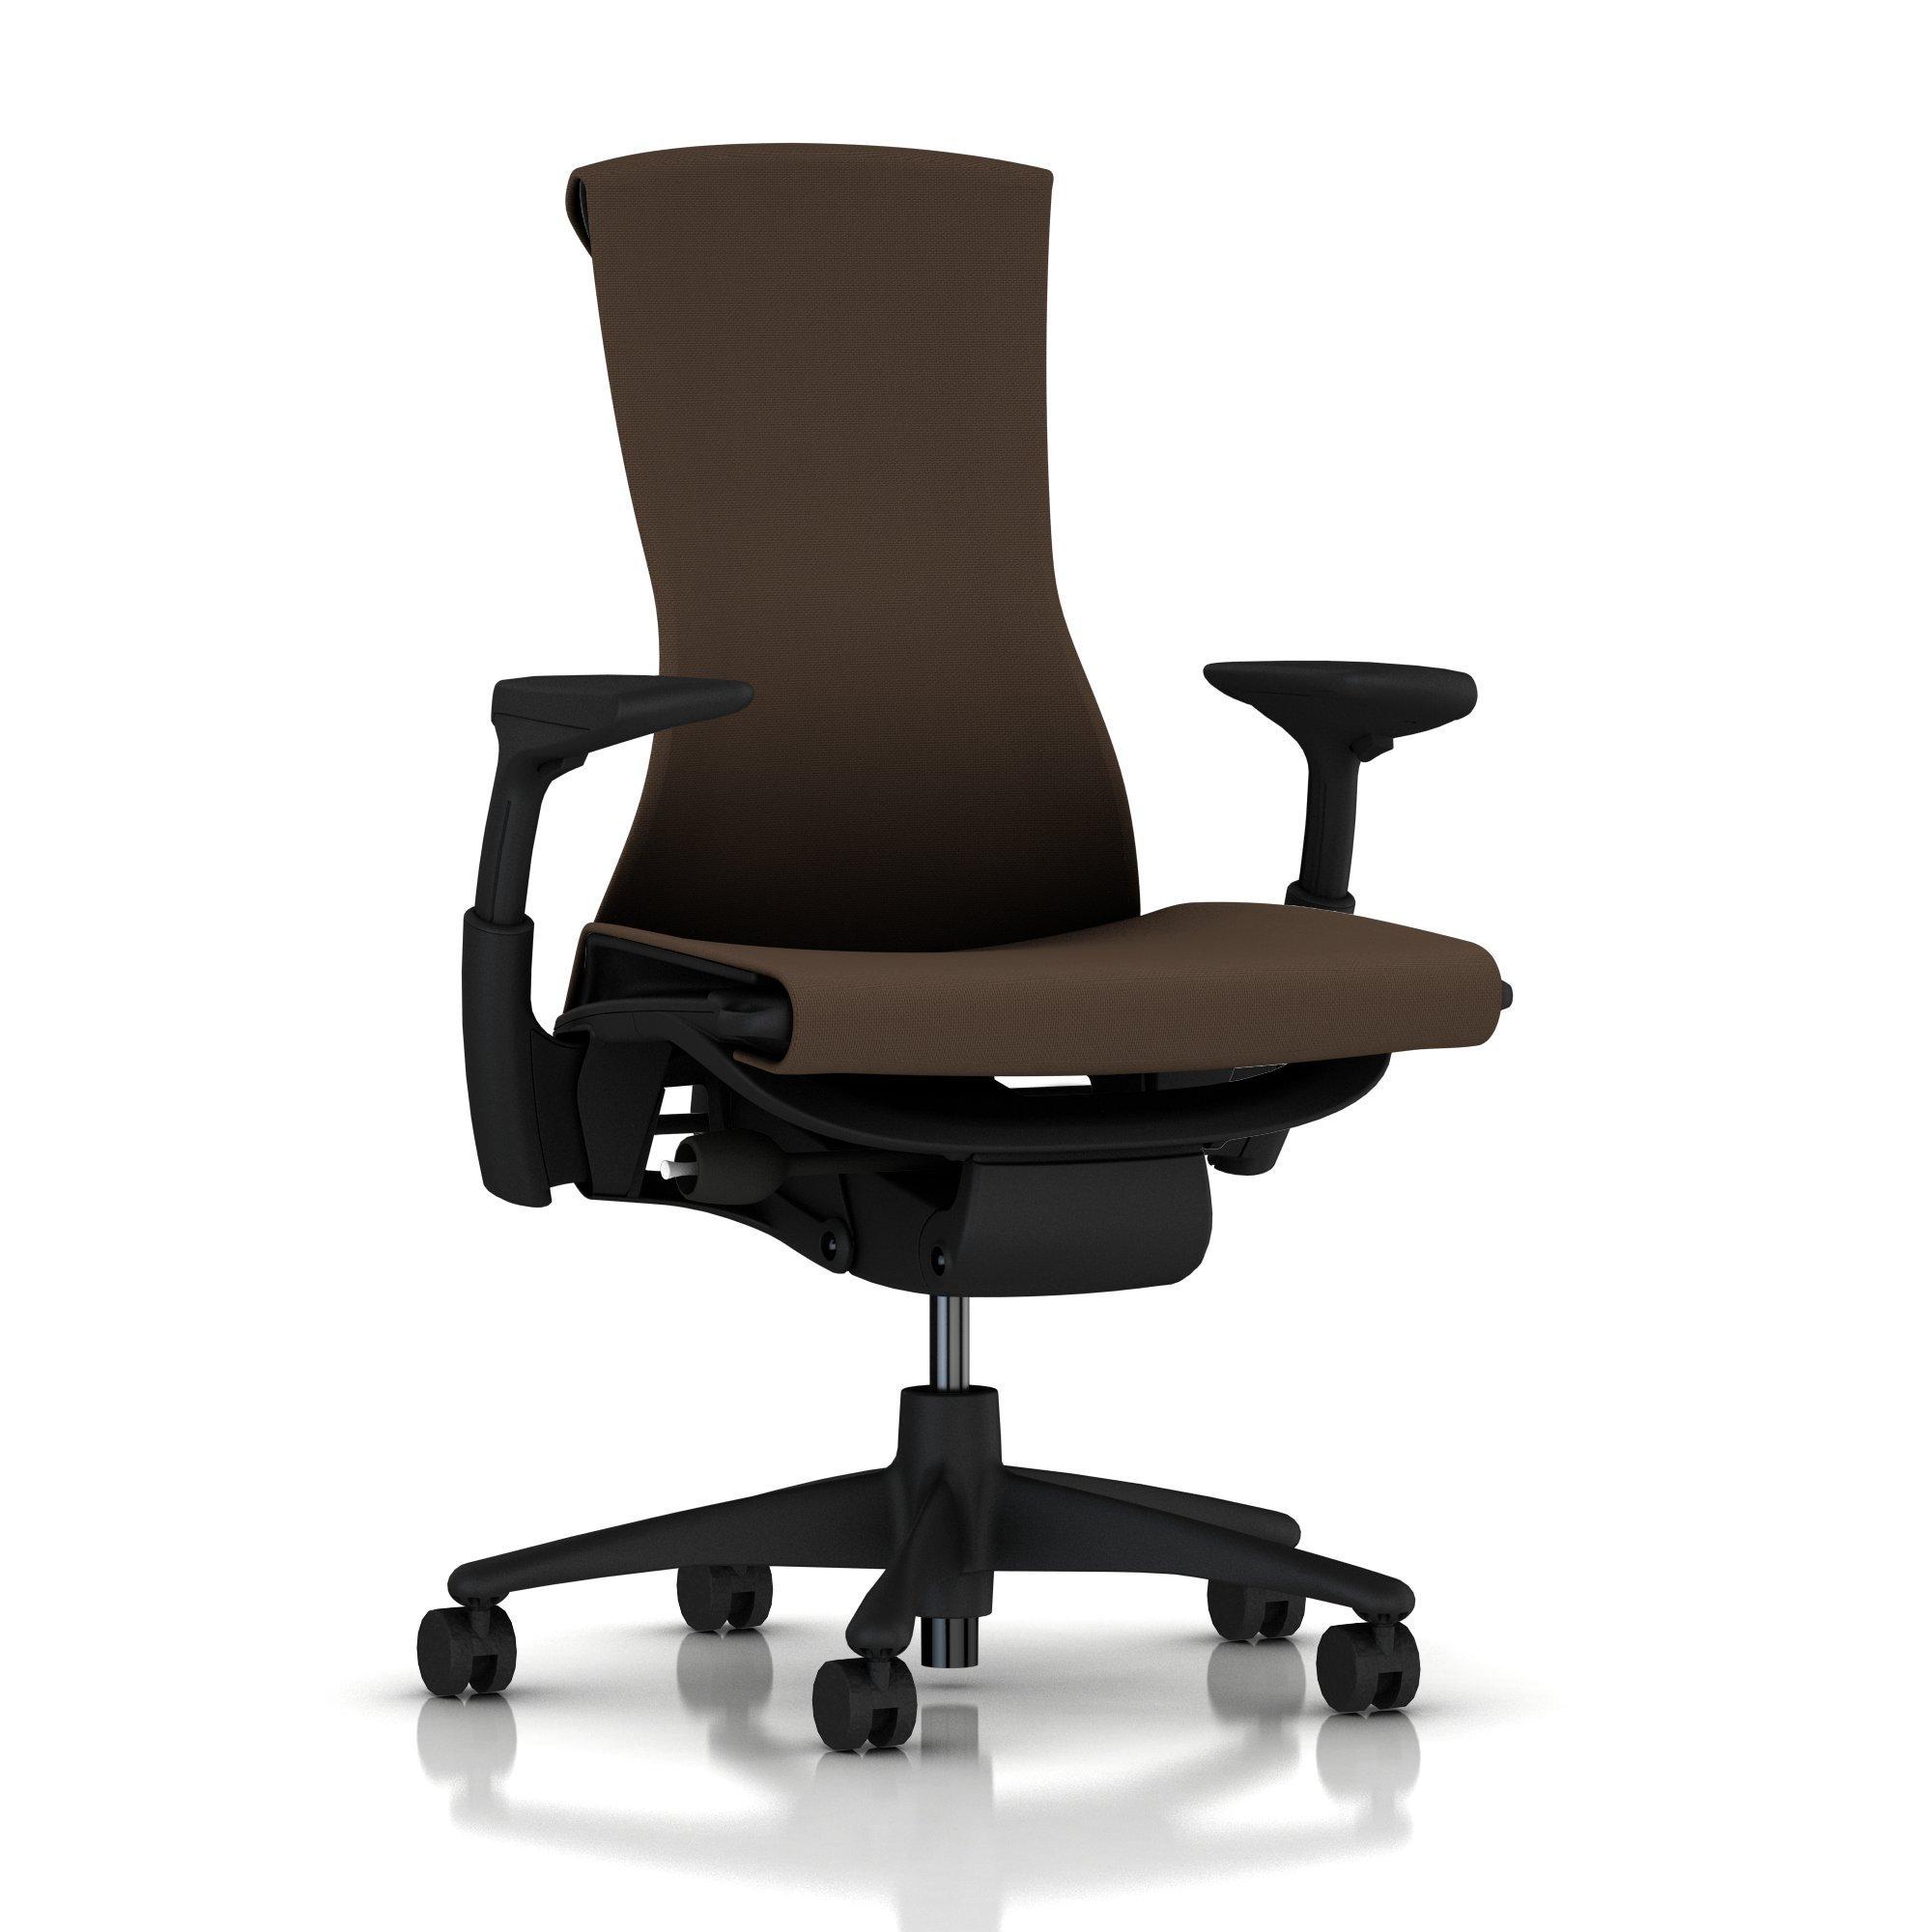 Herman Miller Embody Chair Mink Rhythm With Graphite Frame